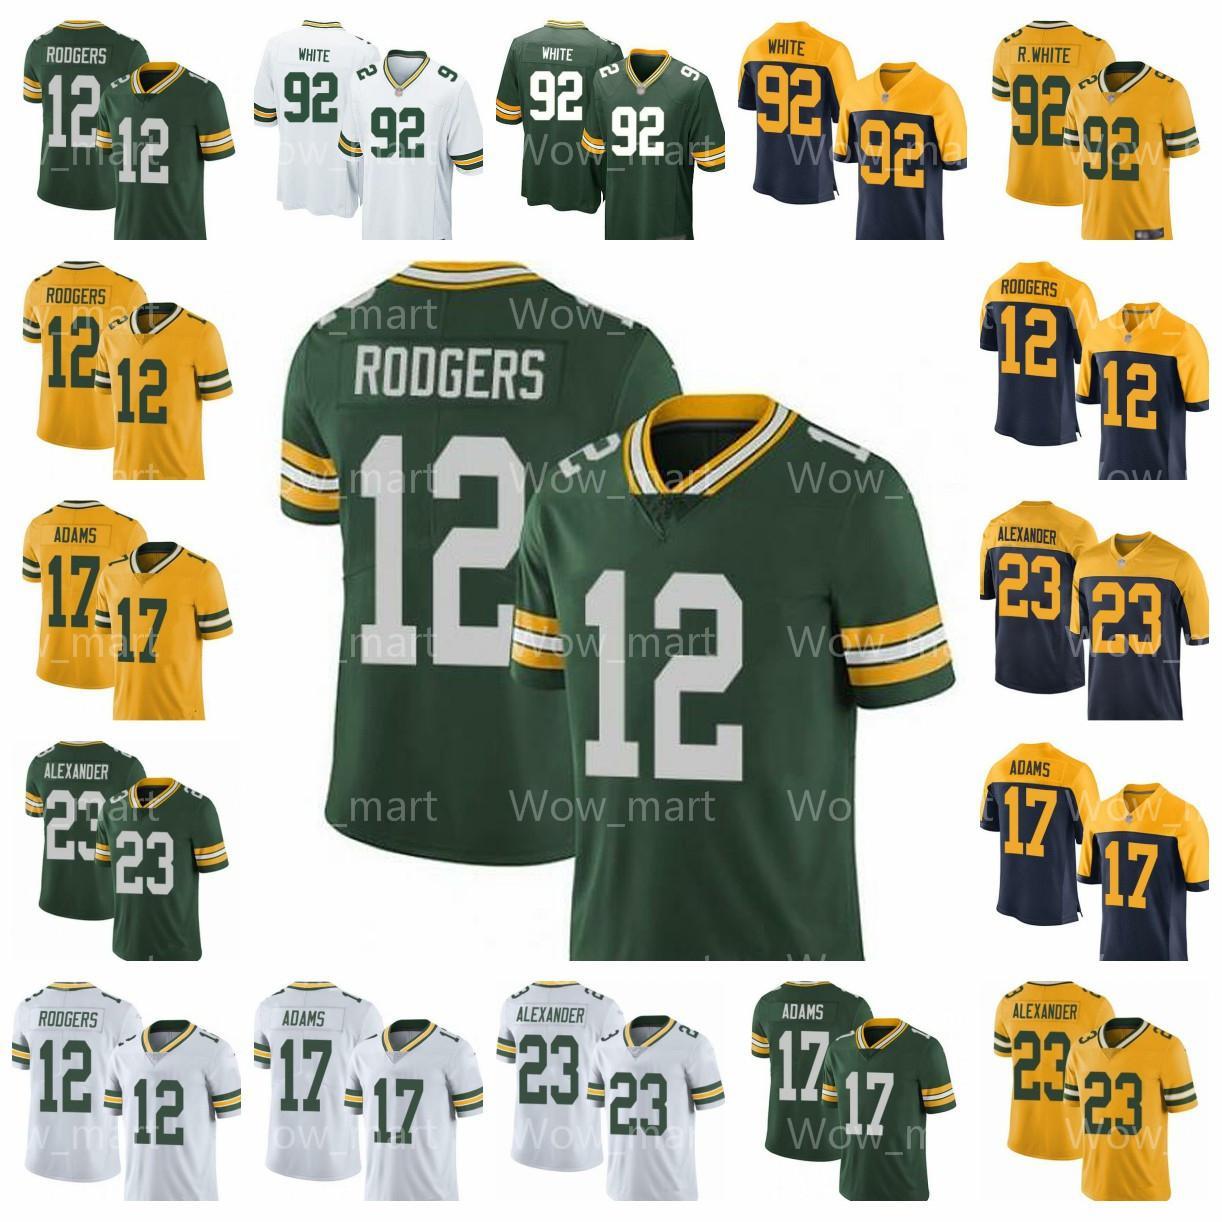 buy online da548 b790a 23 Jaire Alexander Mens Women Youth Kids Green Bay Packer Jersey 12 Aaron  Rodgers Davante Adams Reggie White Feb Football Jerseys